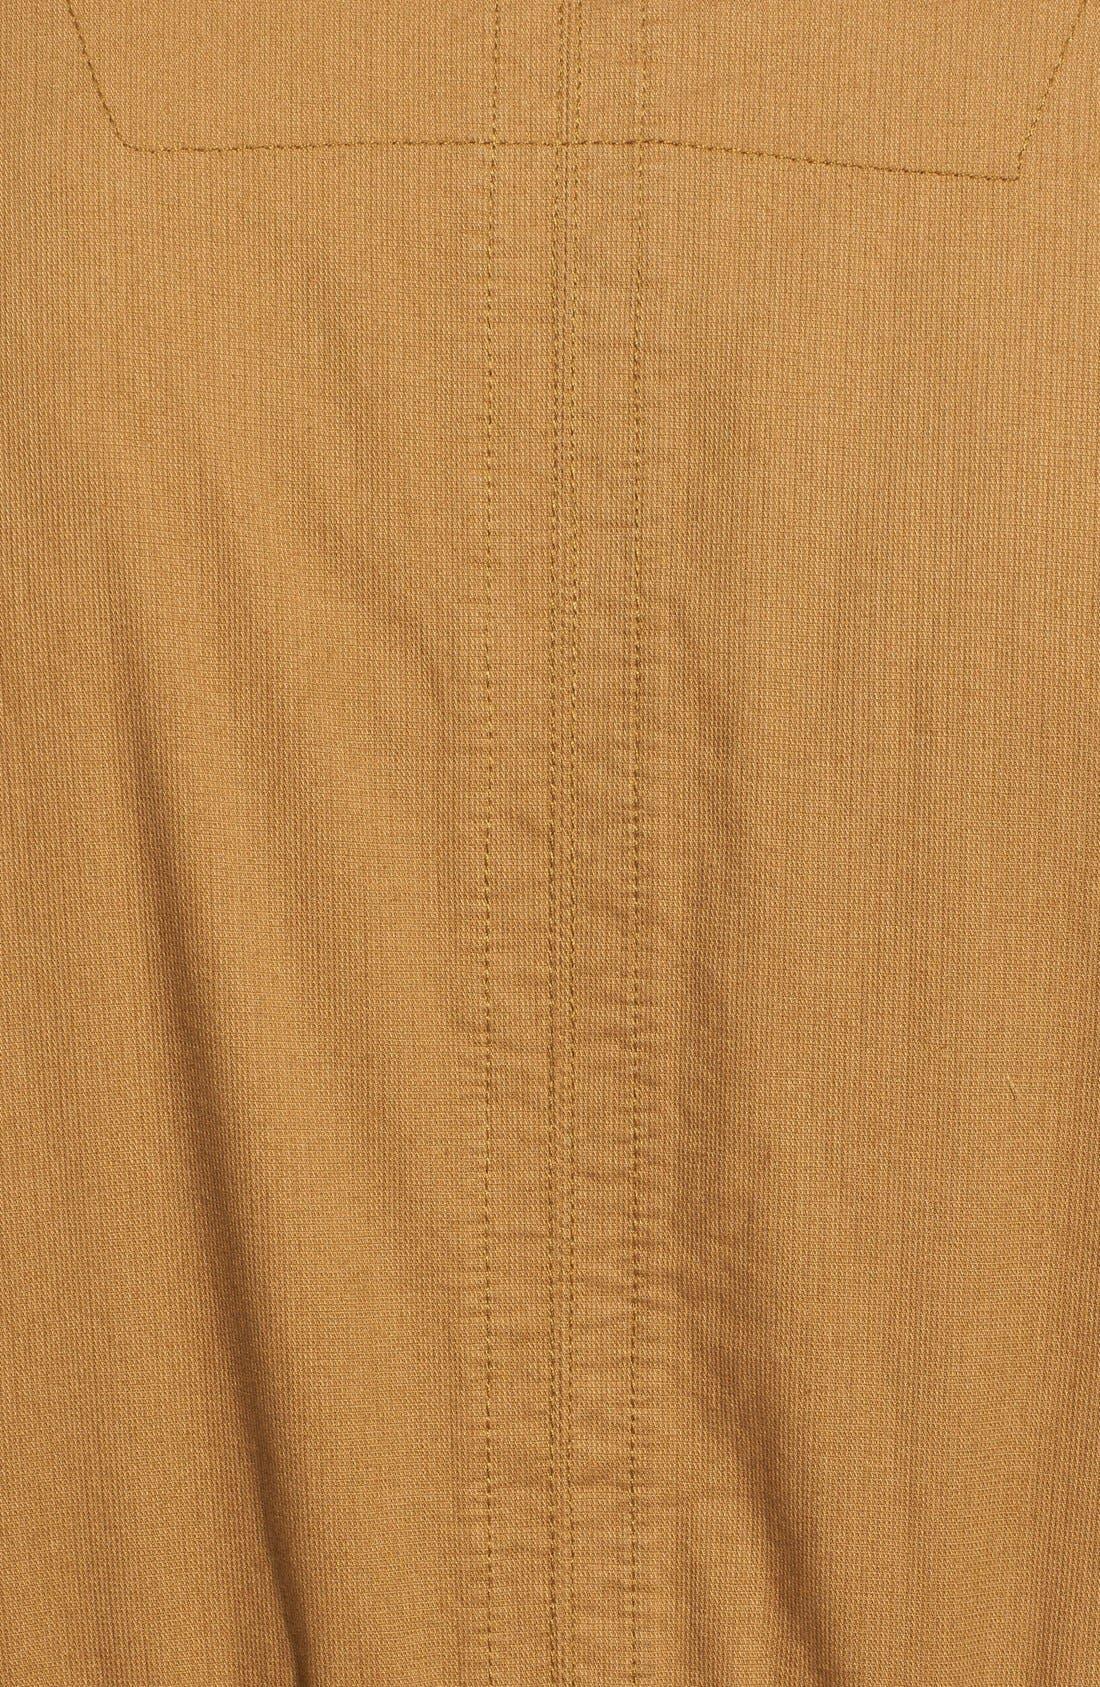 'Abington' Field Jacket,                             Alternate thumbnail 3, color,                             205